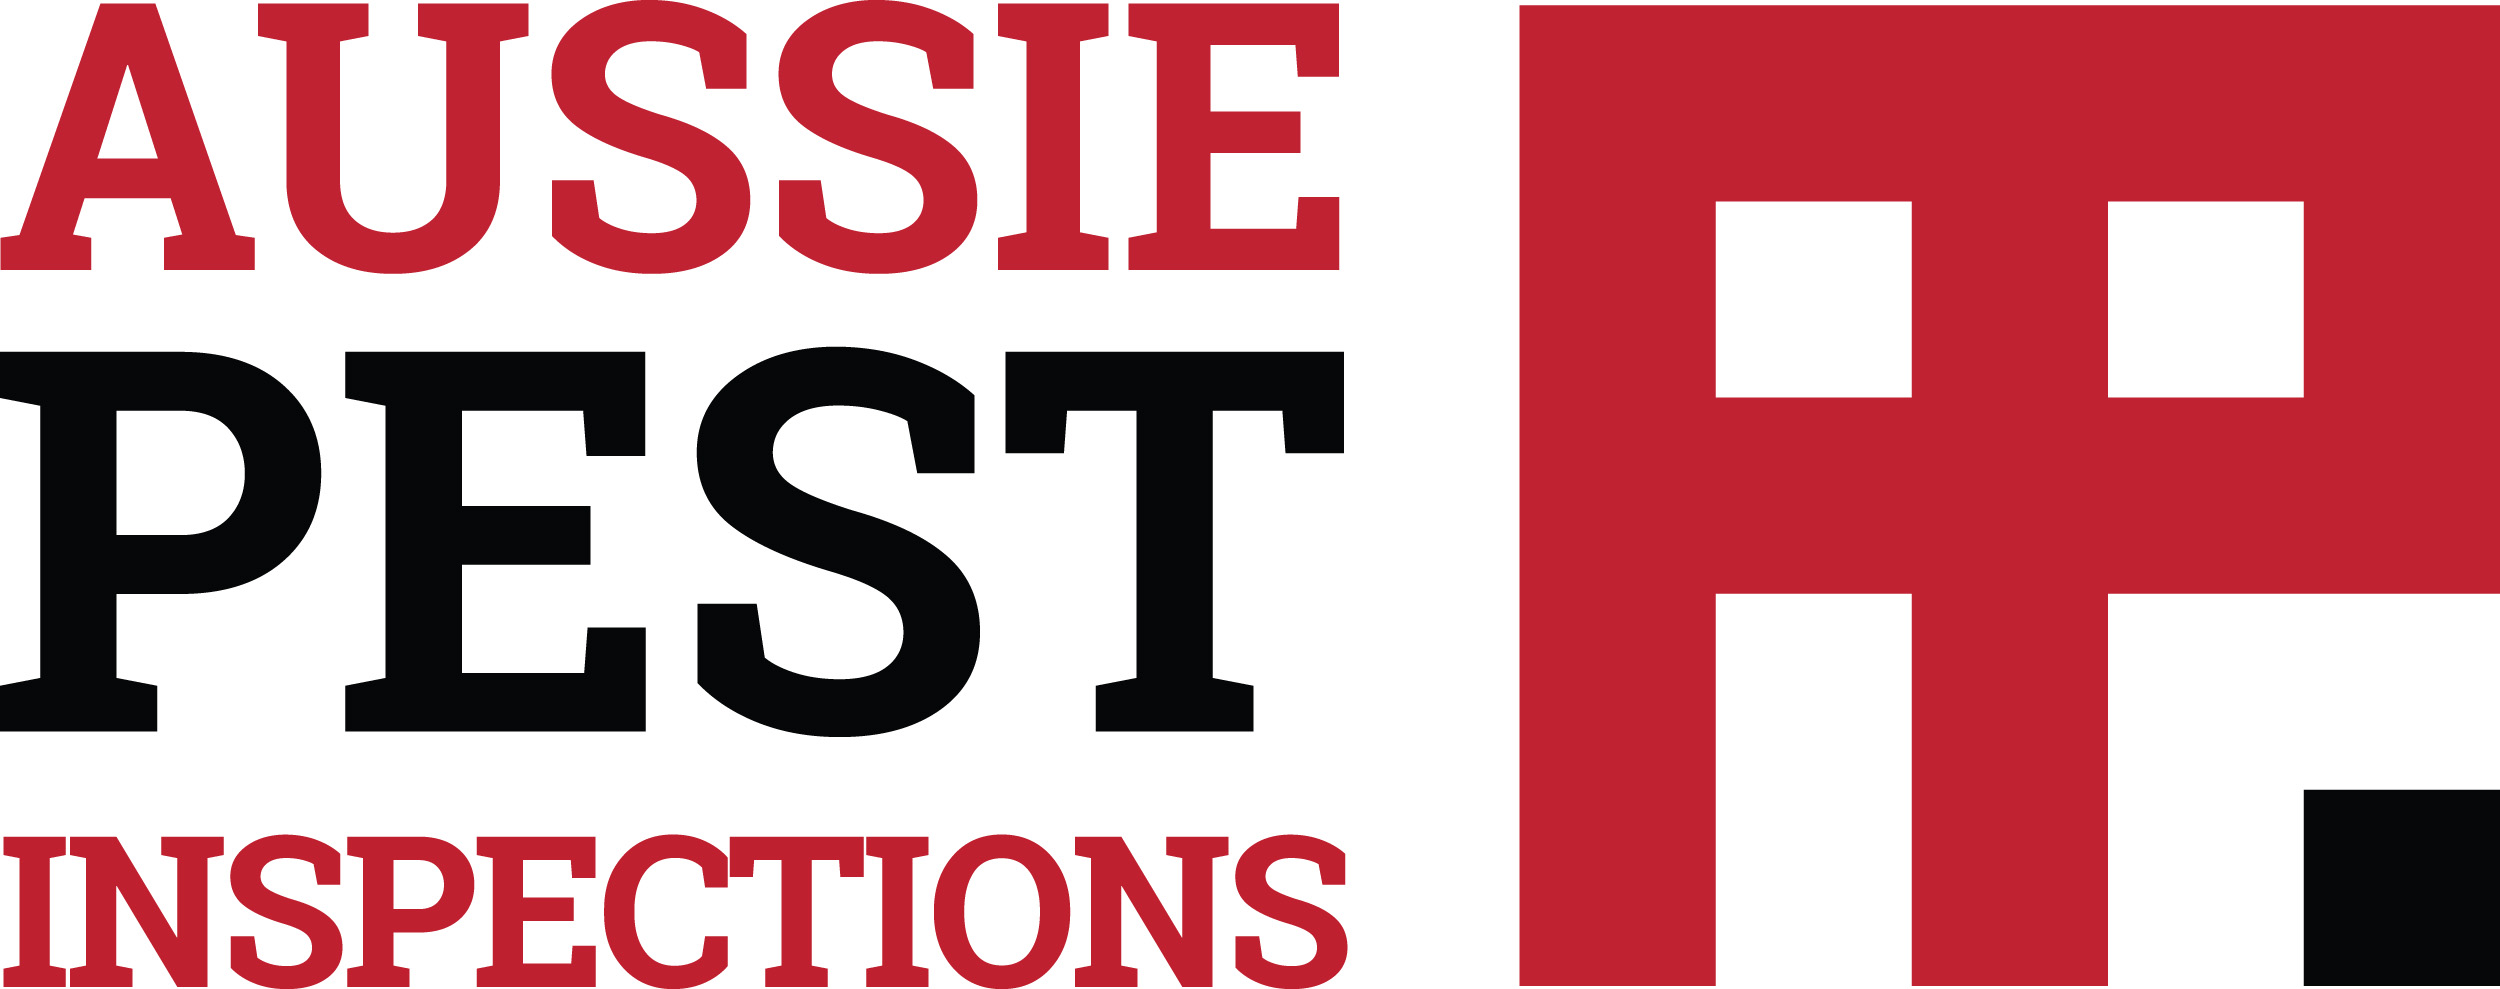 Aussie Pest Inspections logo